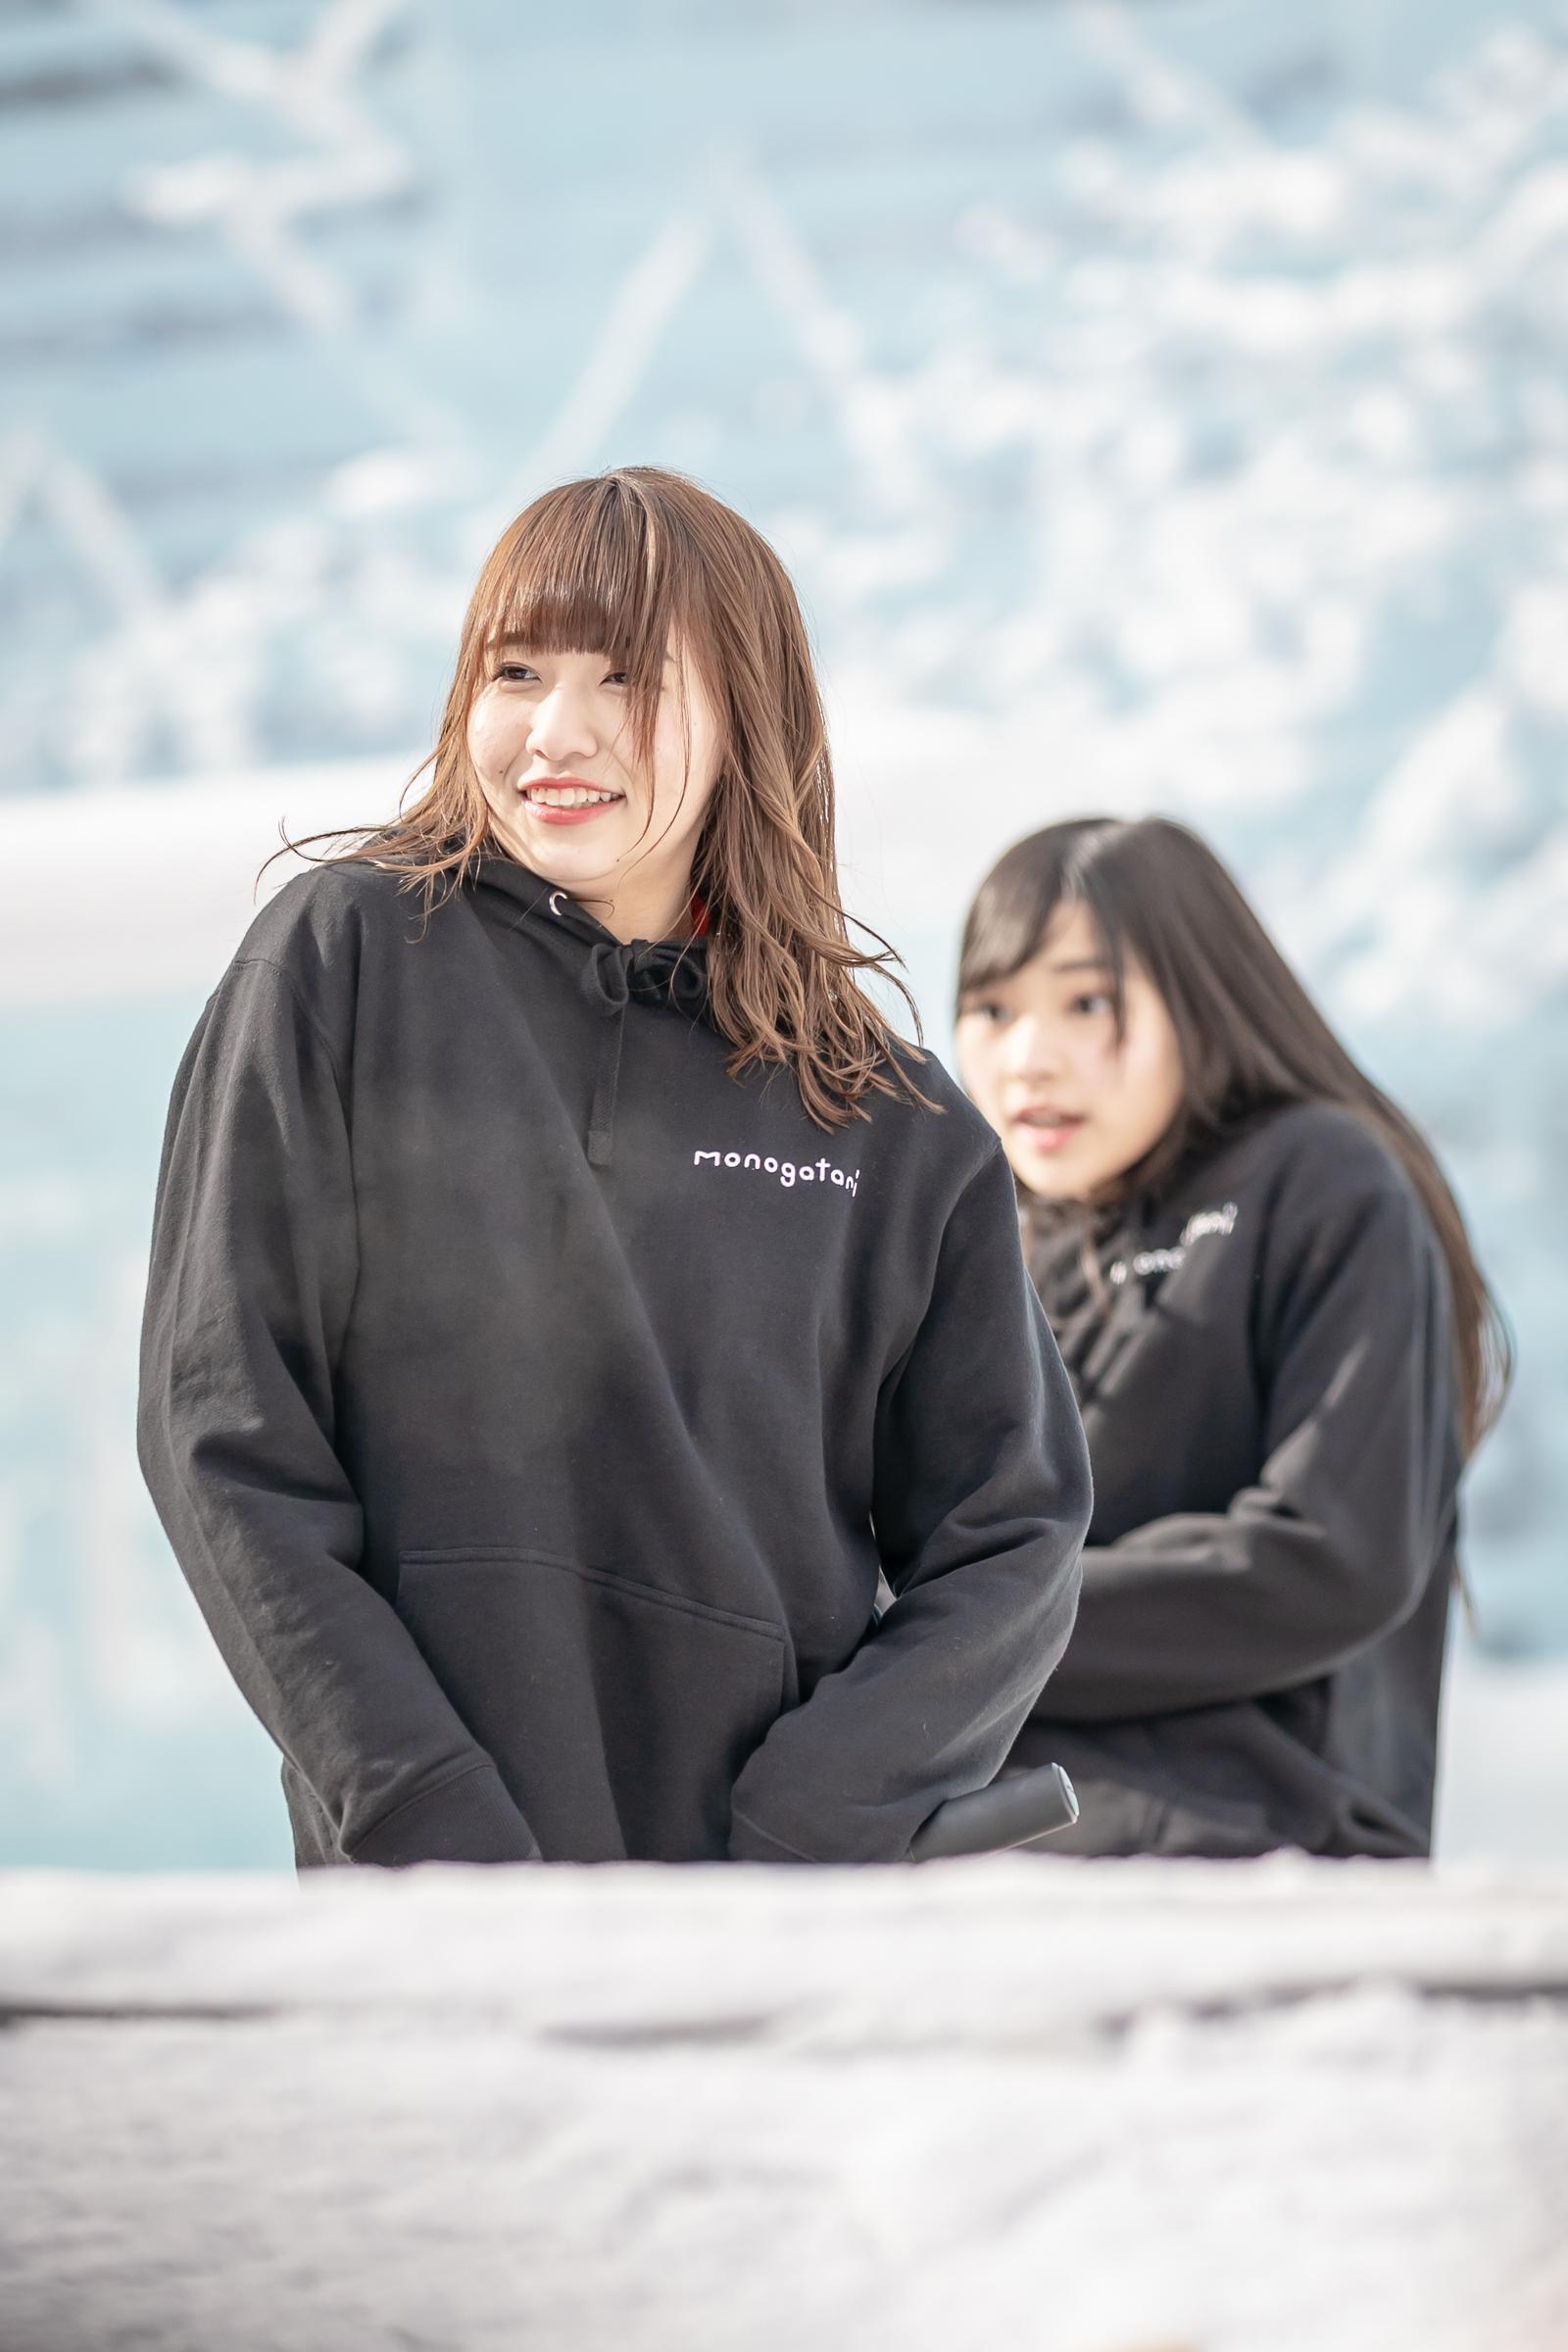 monogatari 歌代ミク | 第70回さっぽろ雪まつり